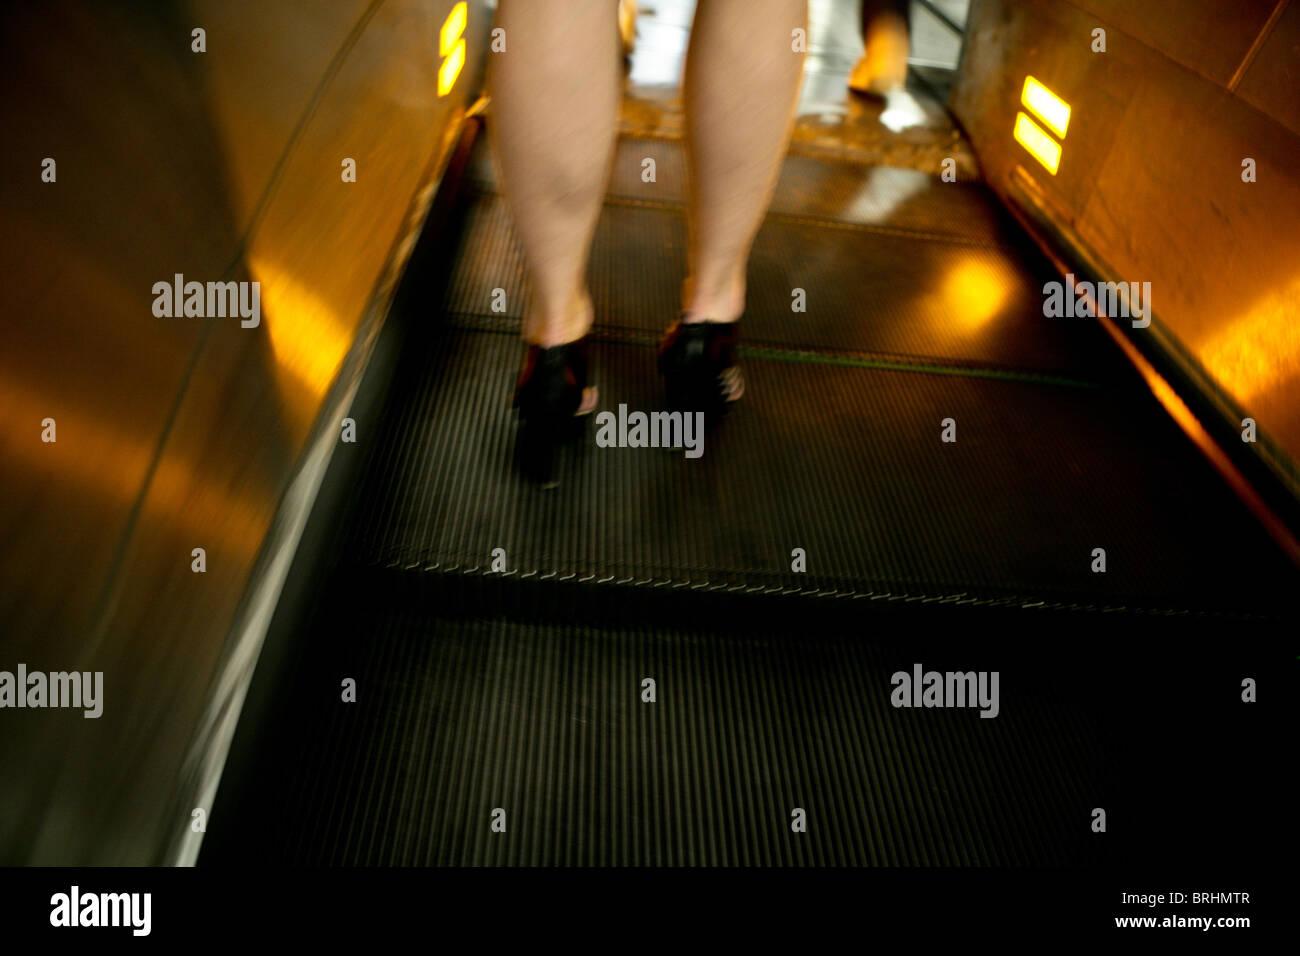 woman legs standing on escalator in underground - Stock Image